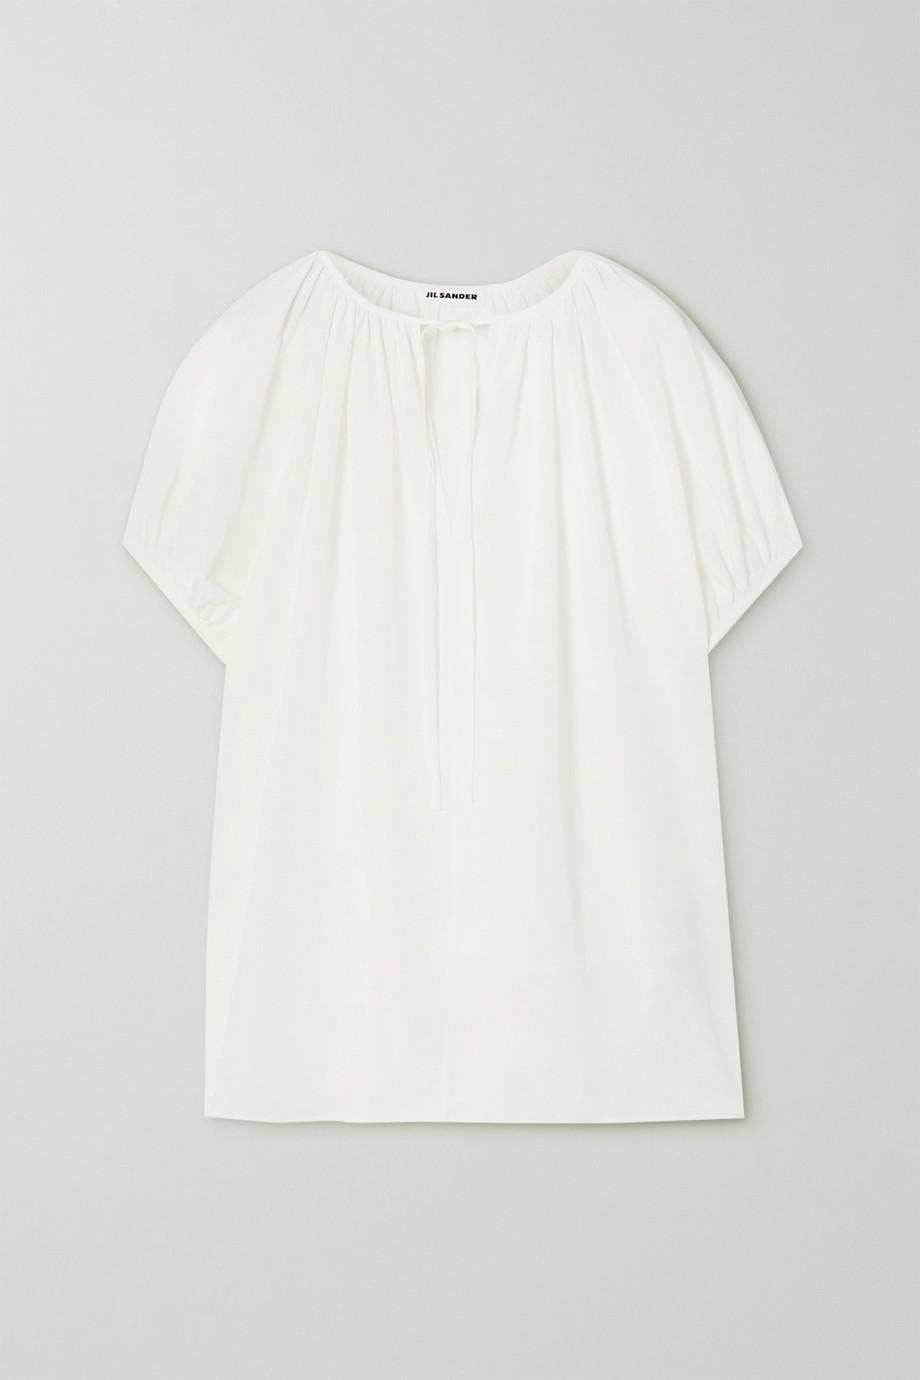 Jil Sander Tie-detailed voile blouse